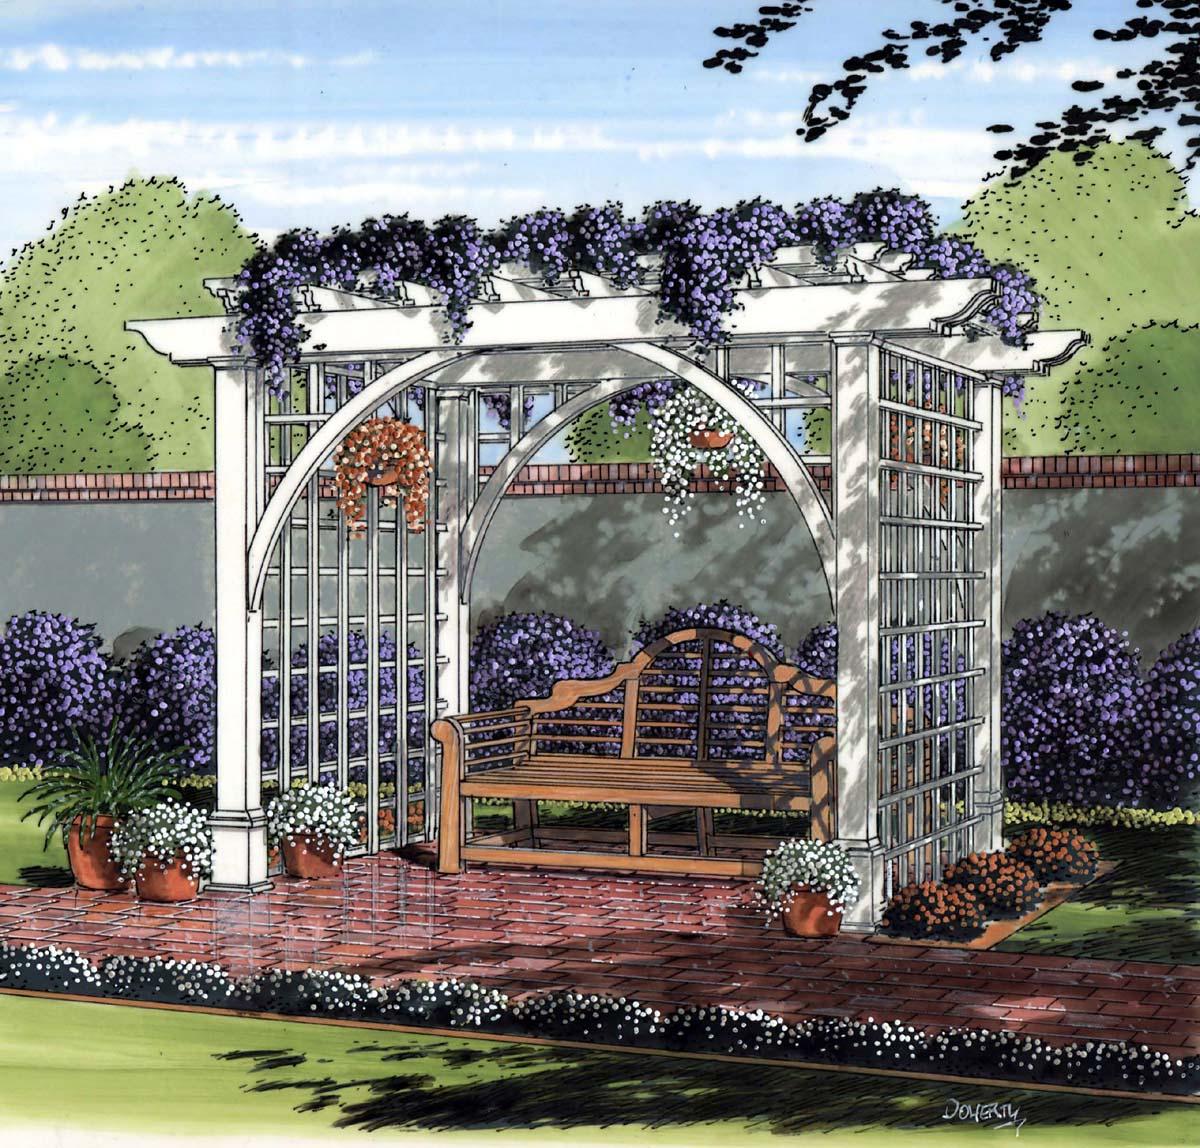 504889 - Garden Arbor